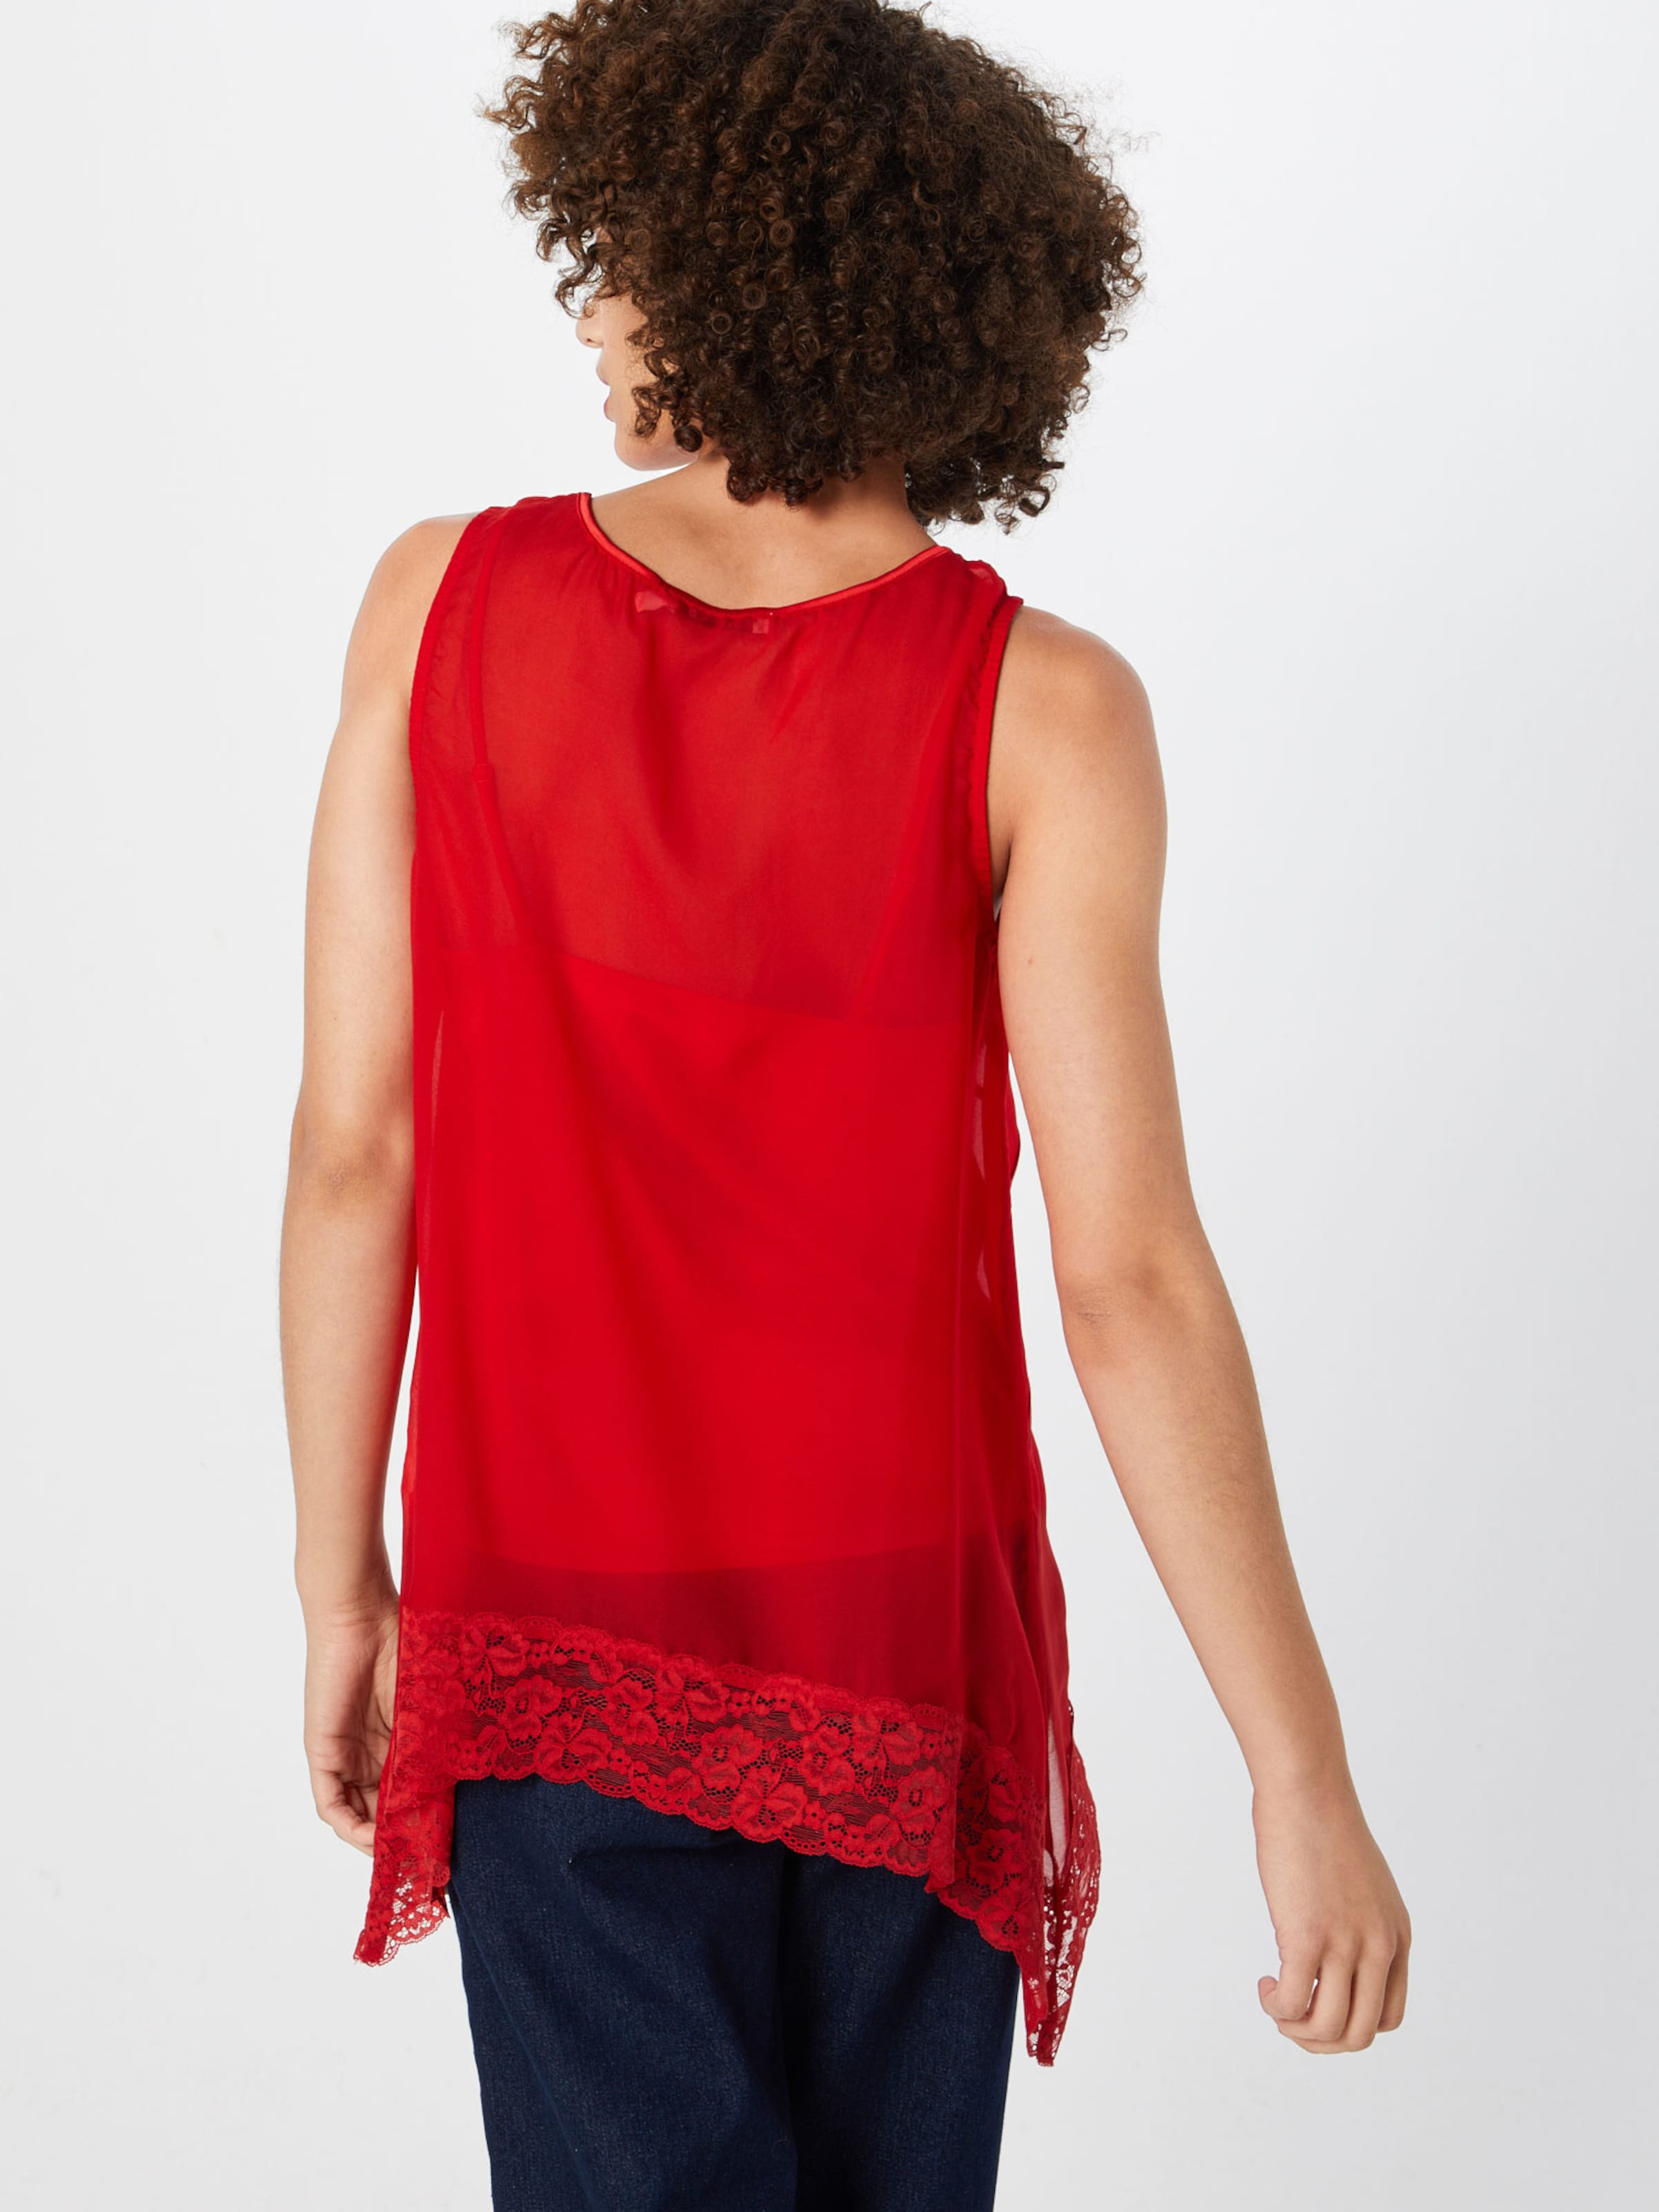 Top In kd Hem Rot 'asymmetric Lace Singlet' Na 13lKTJcF